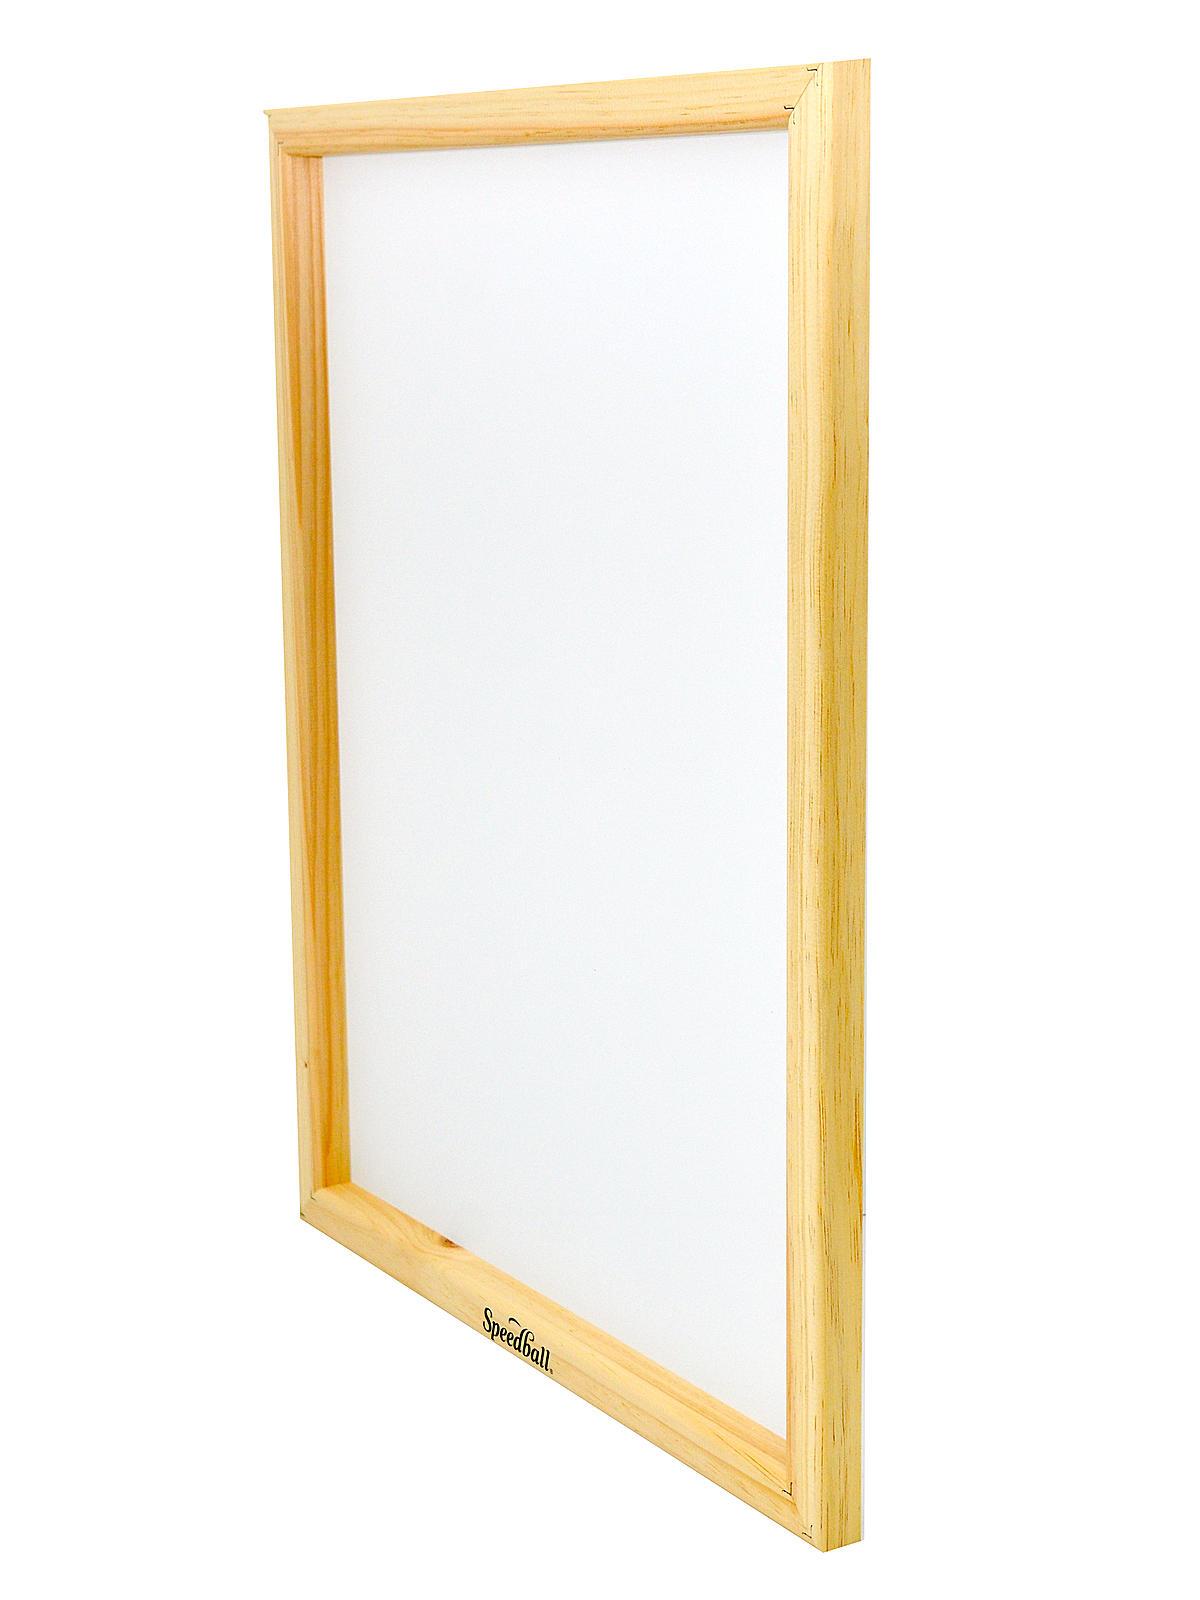 Speedball Screen Printing Wood Frames